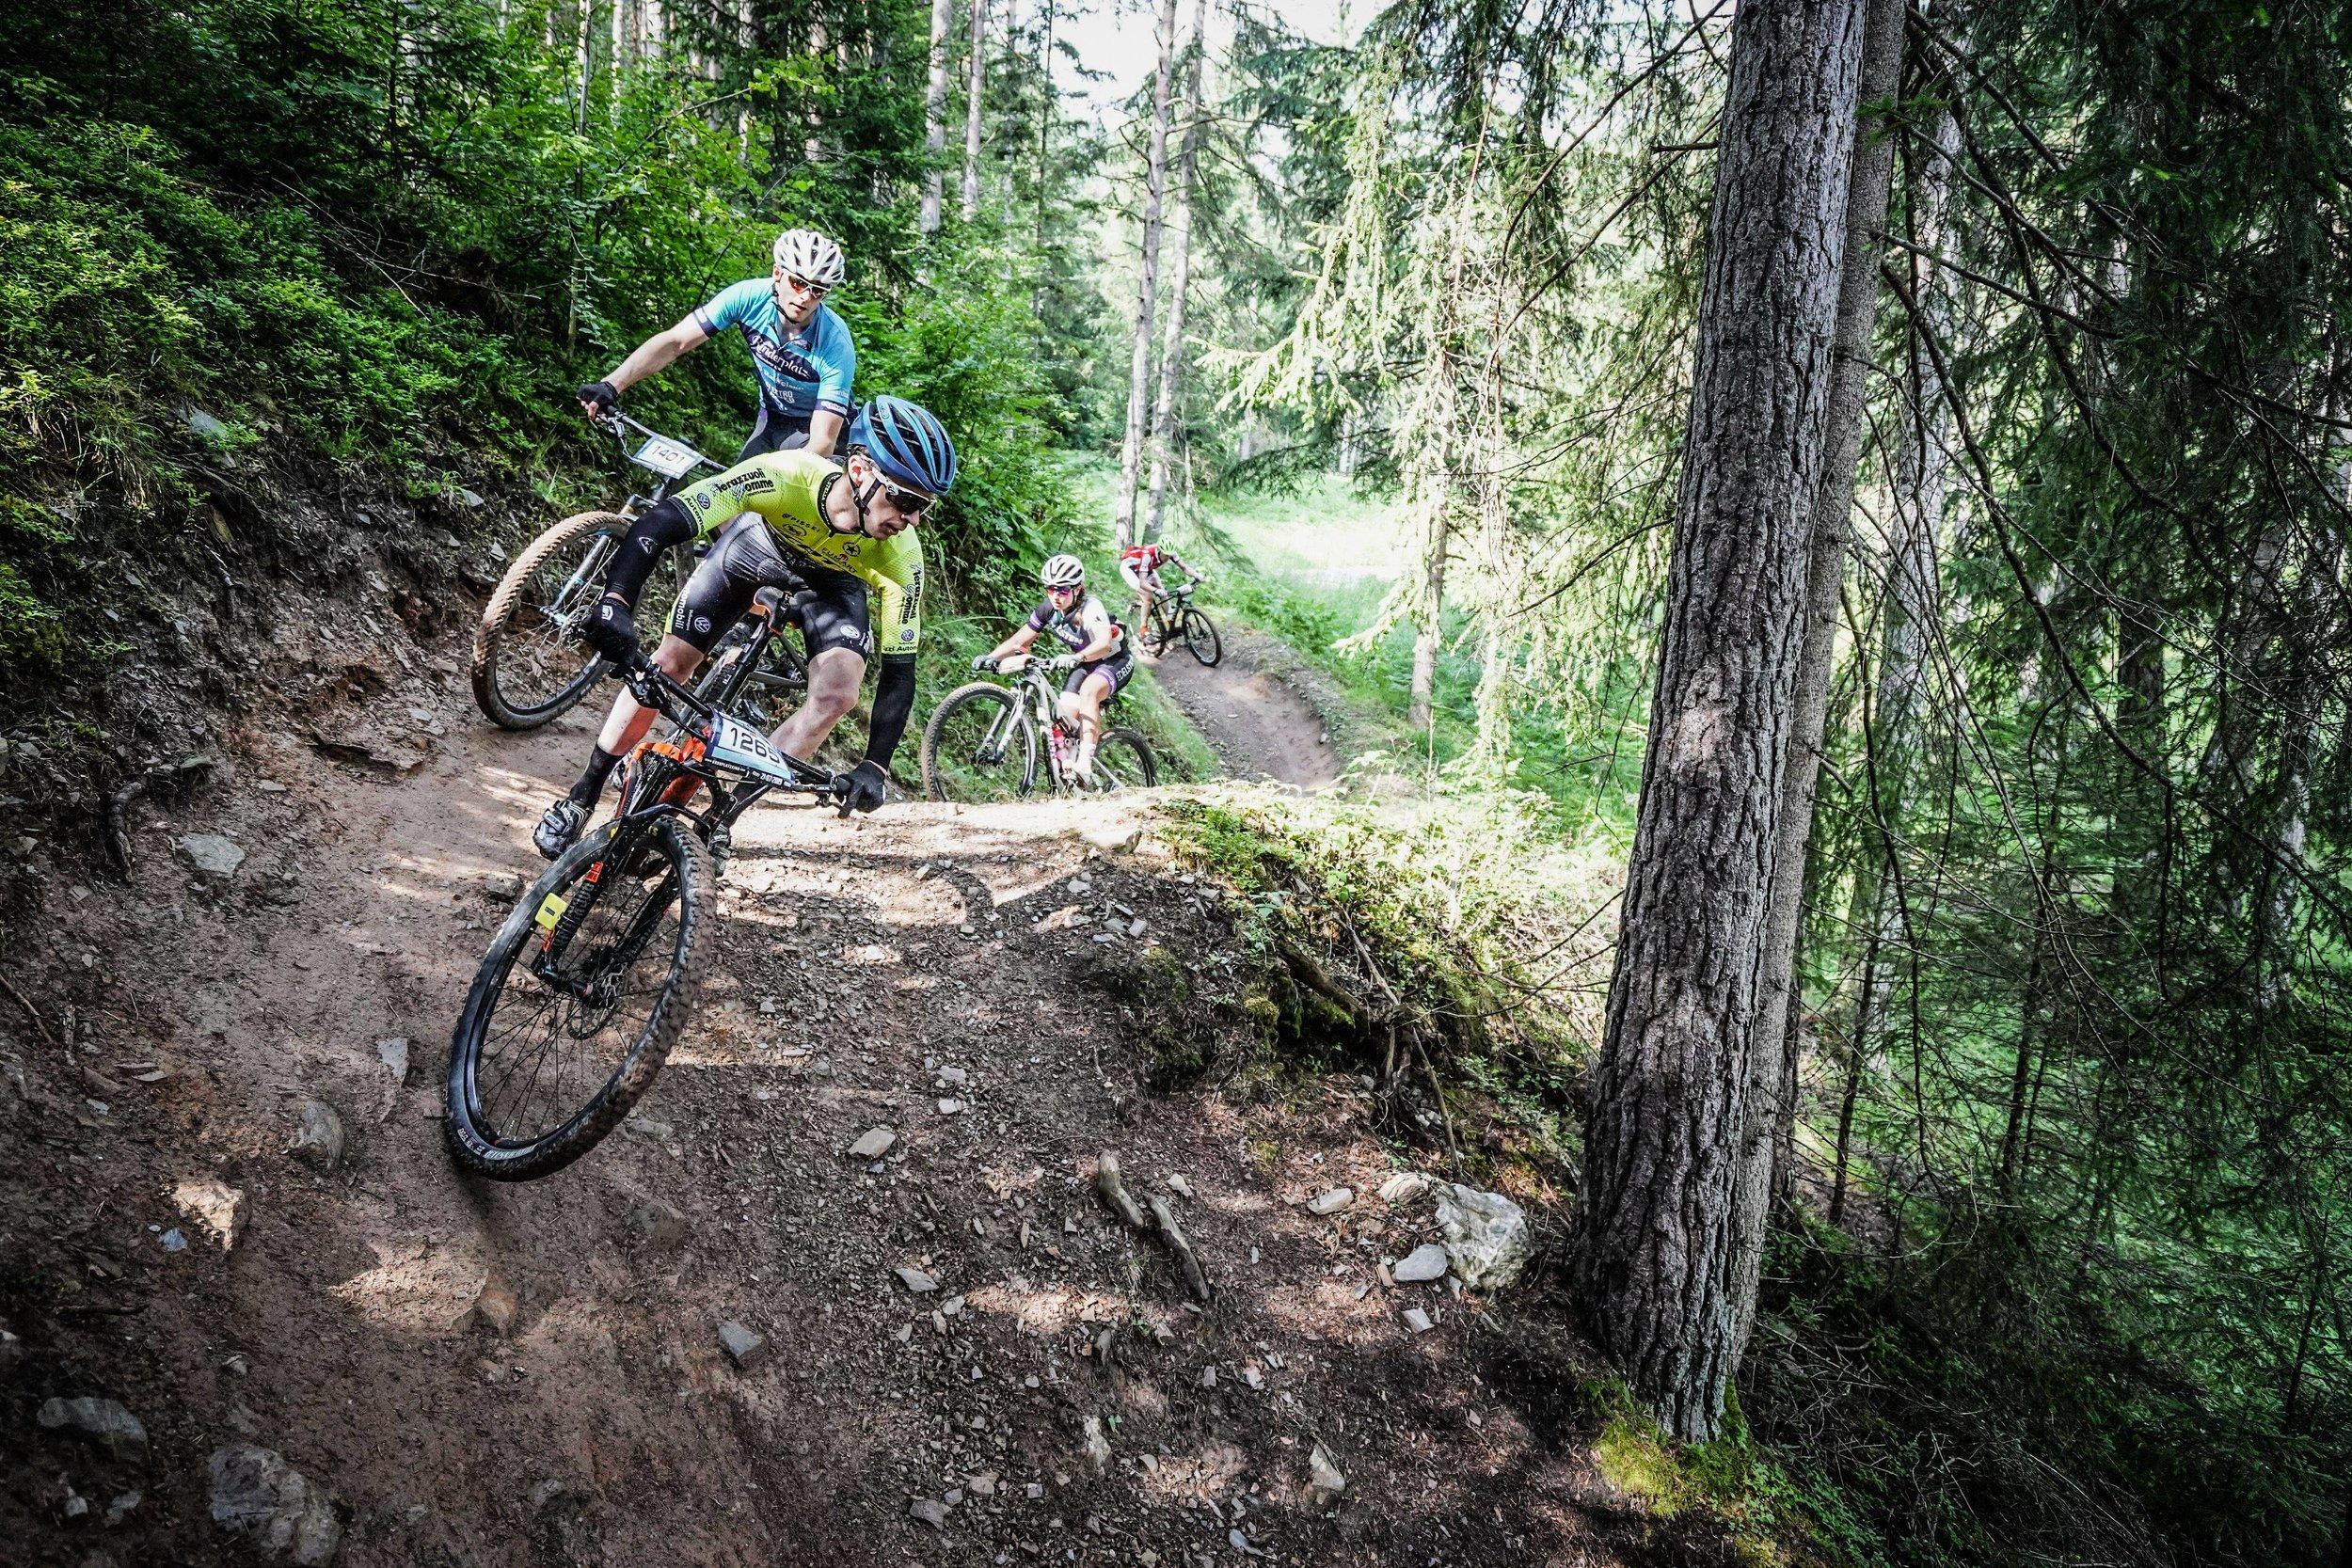 The author descending the free ride trails  ©sportograf